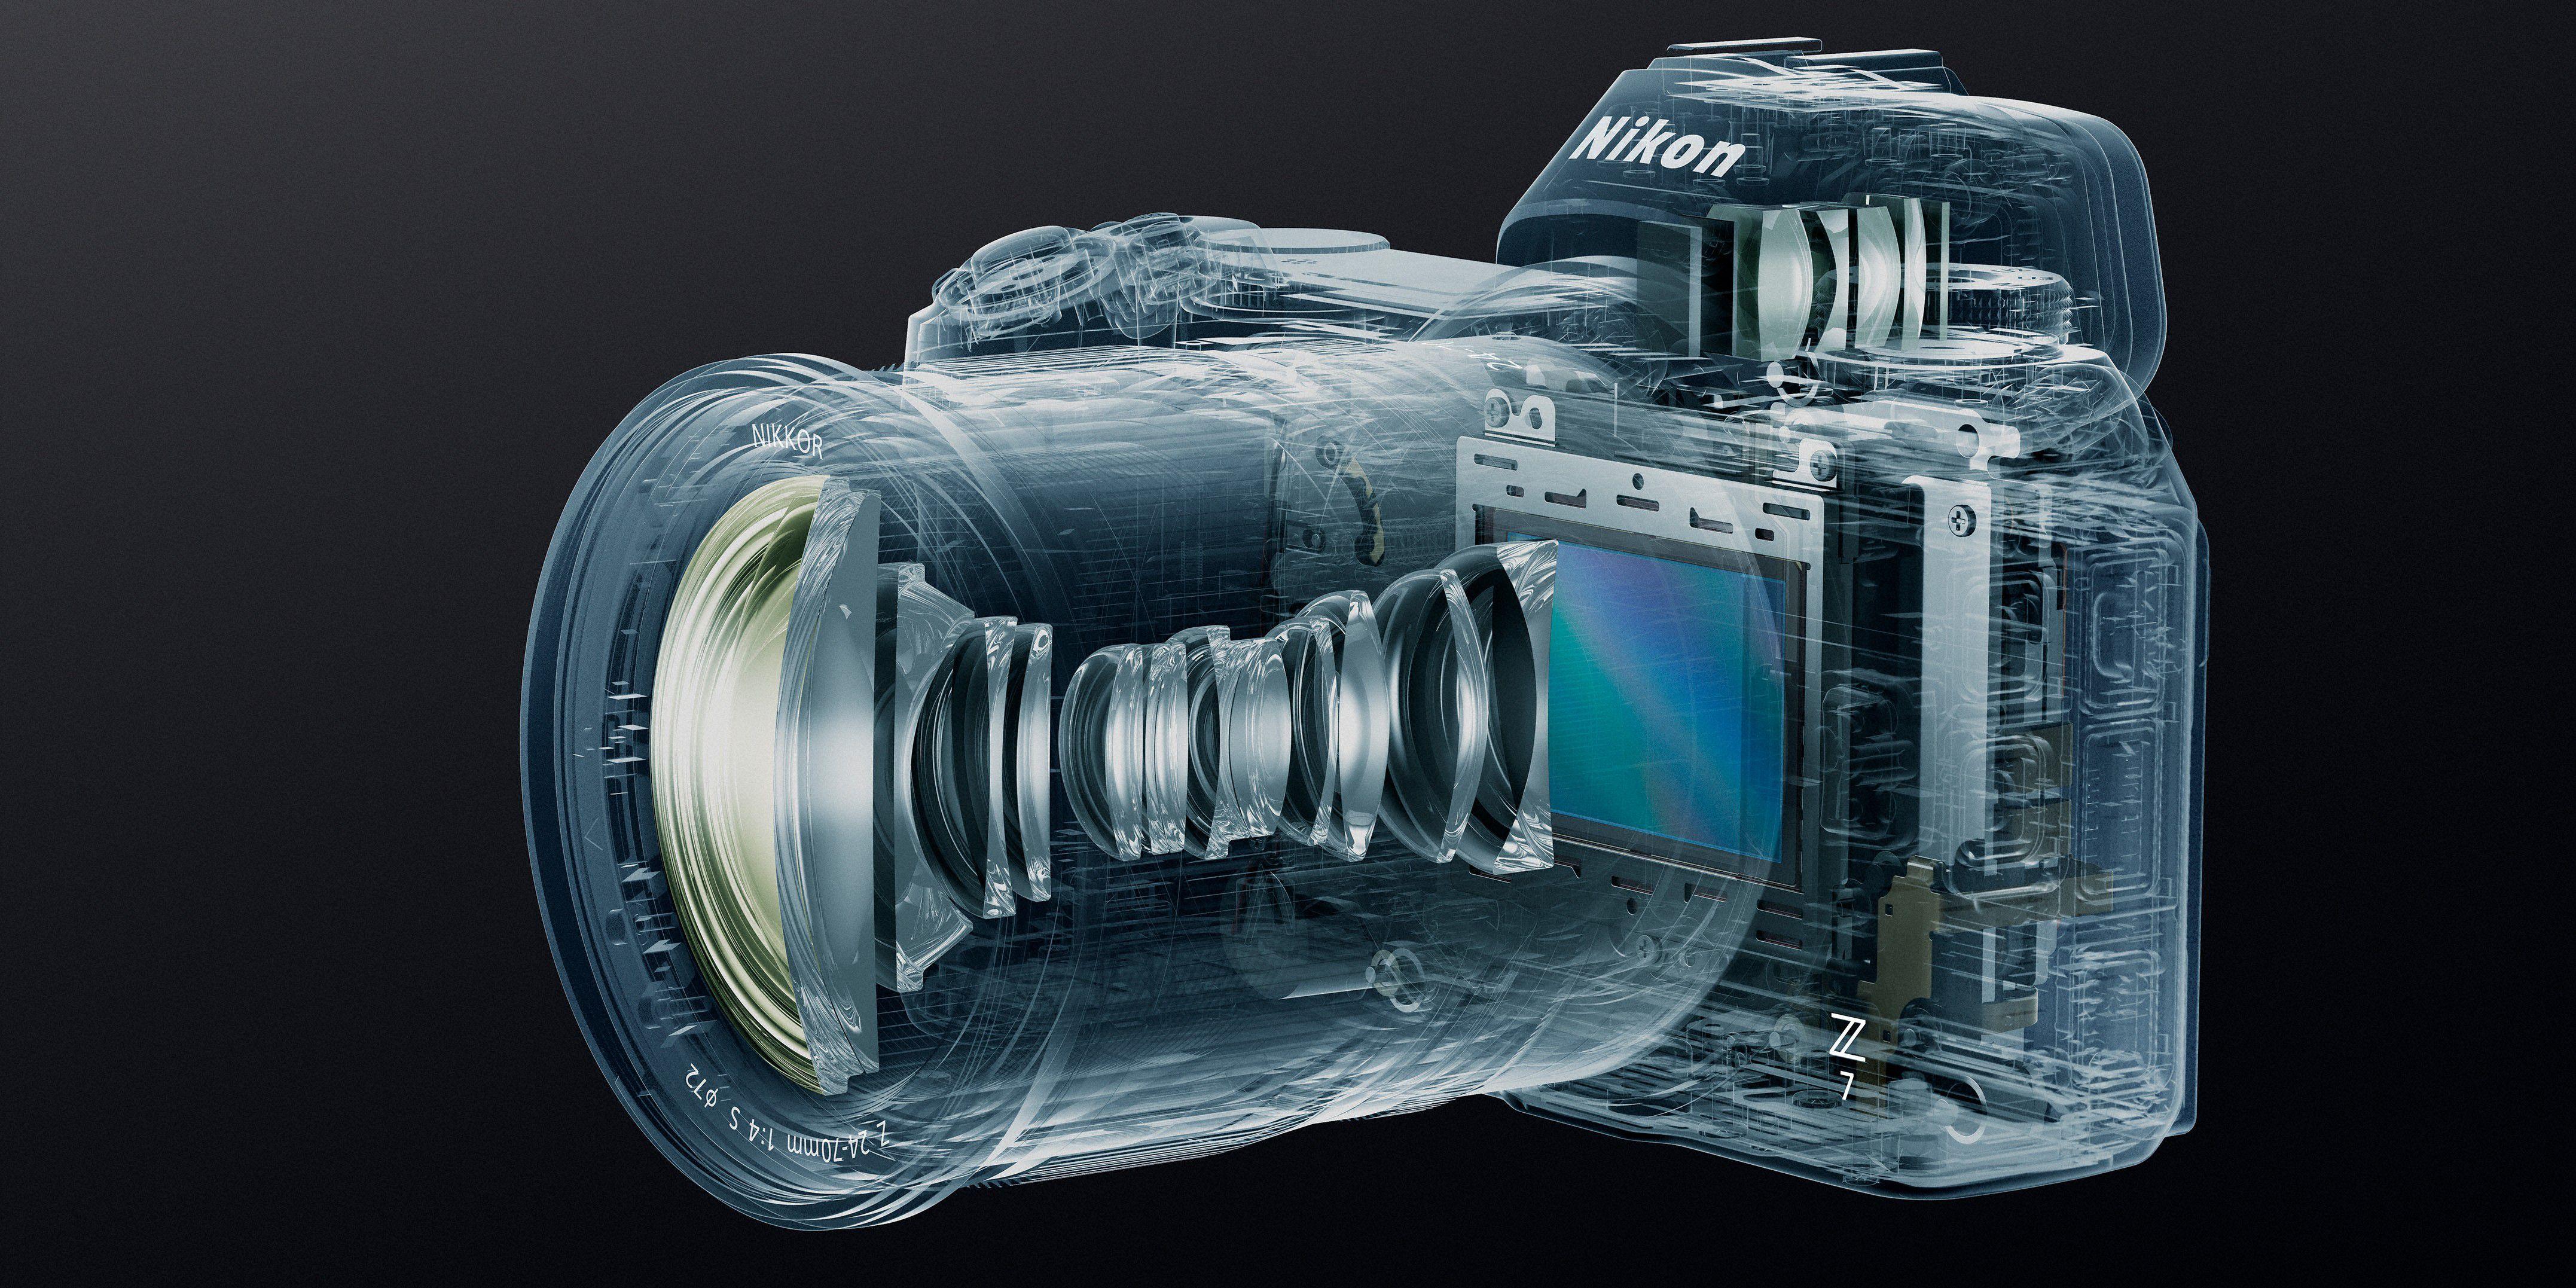 Nikon stellt Vollformat-Systemkameras vor - PC-WELT